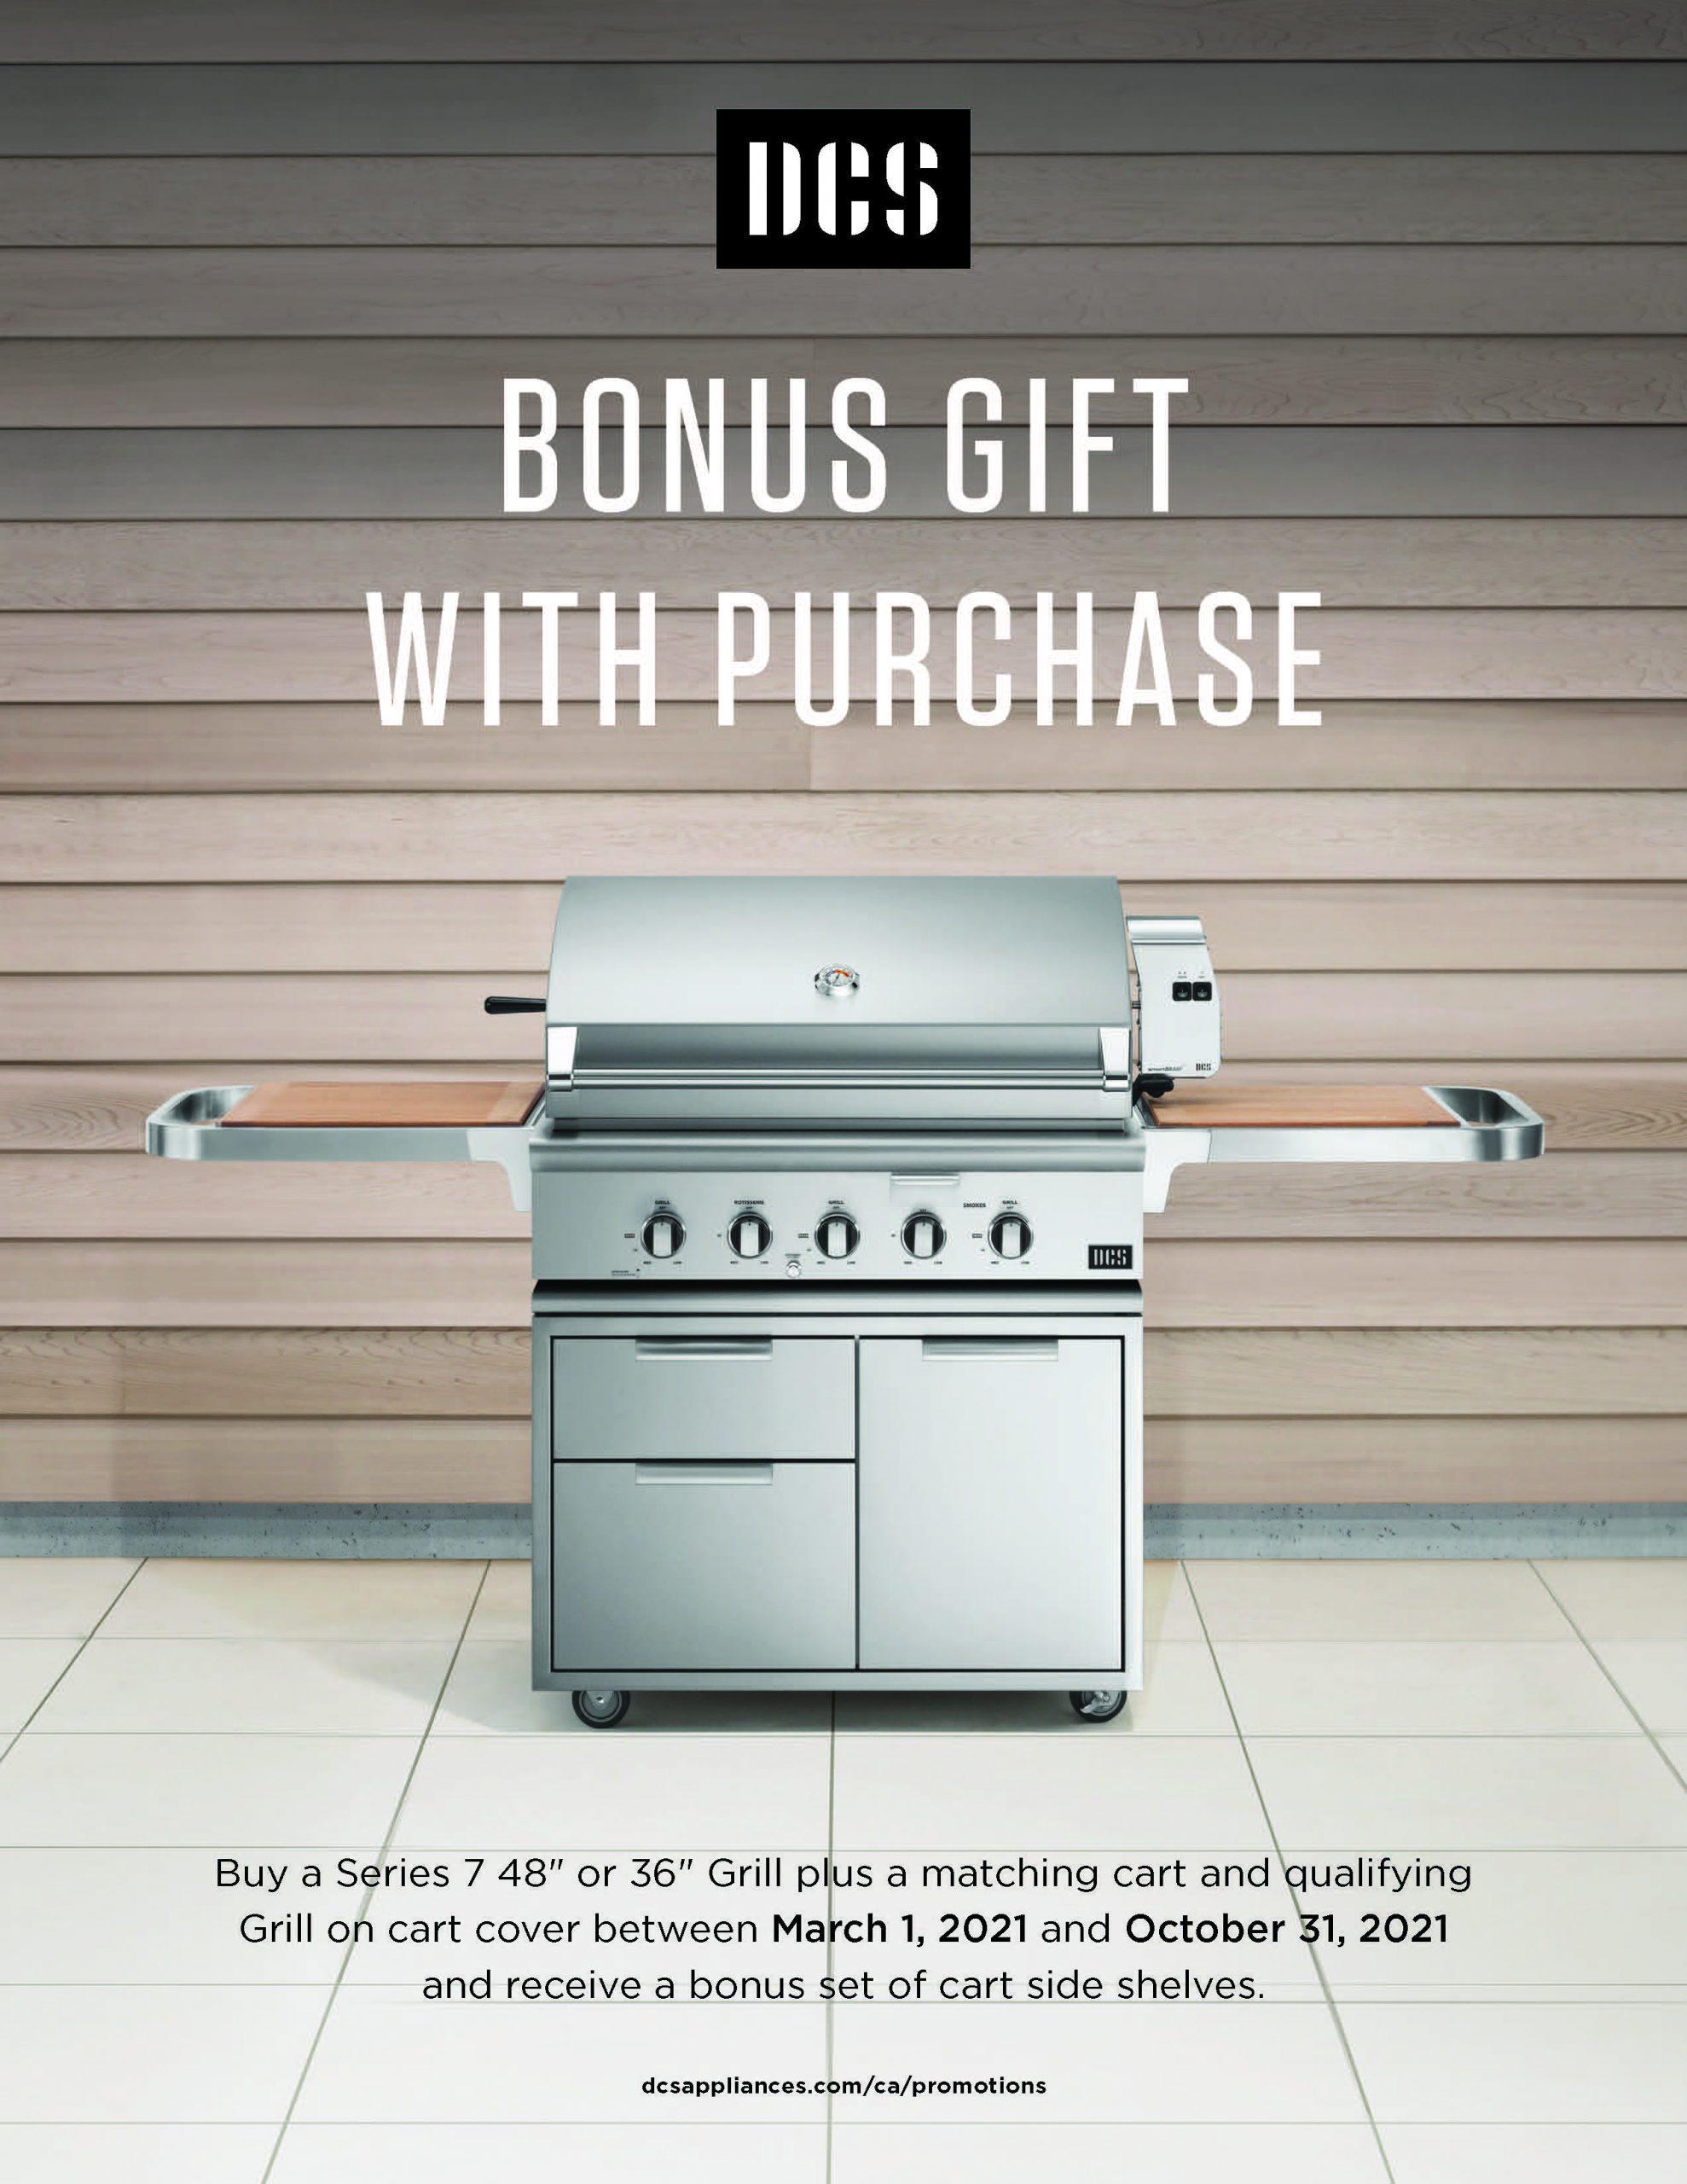 DCS June Promo - Bonus Gift with Purchase